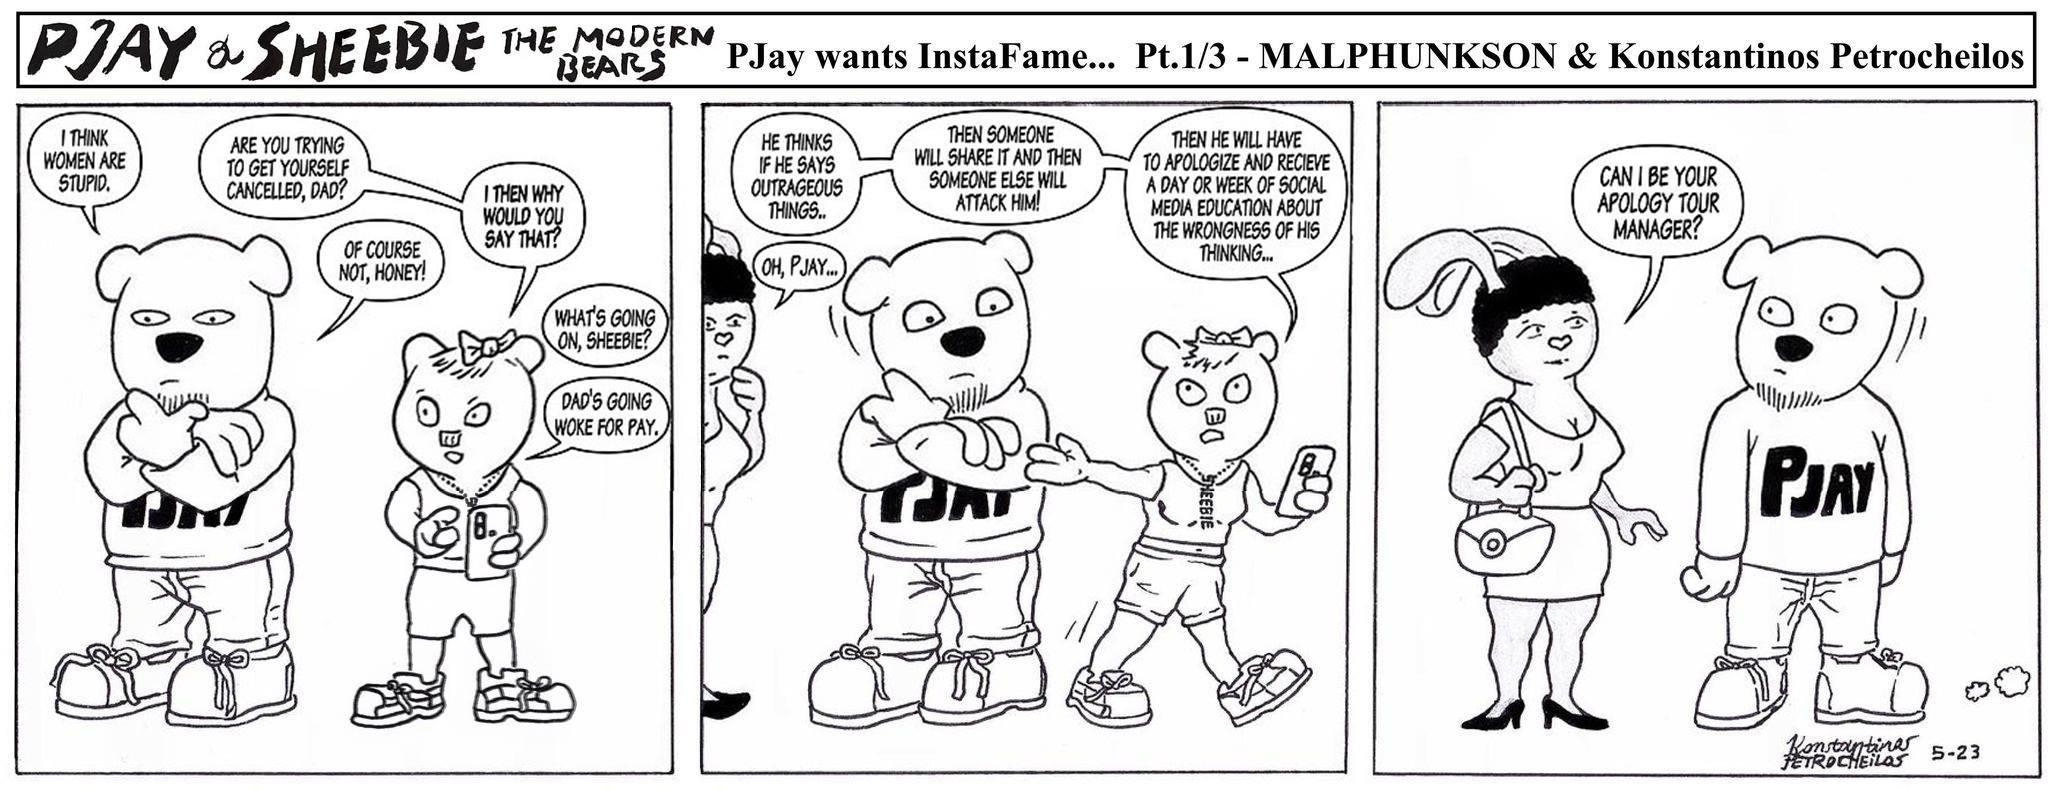 Pjay wants InstaFame